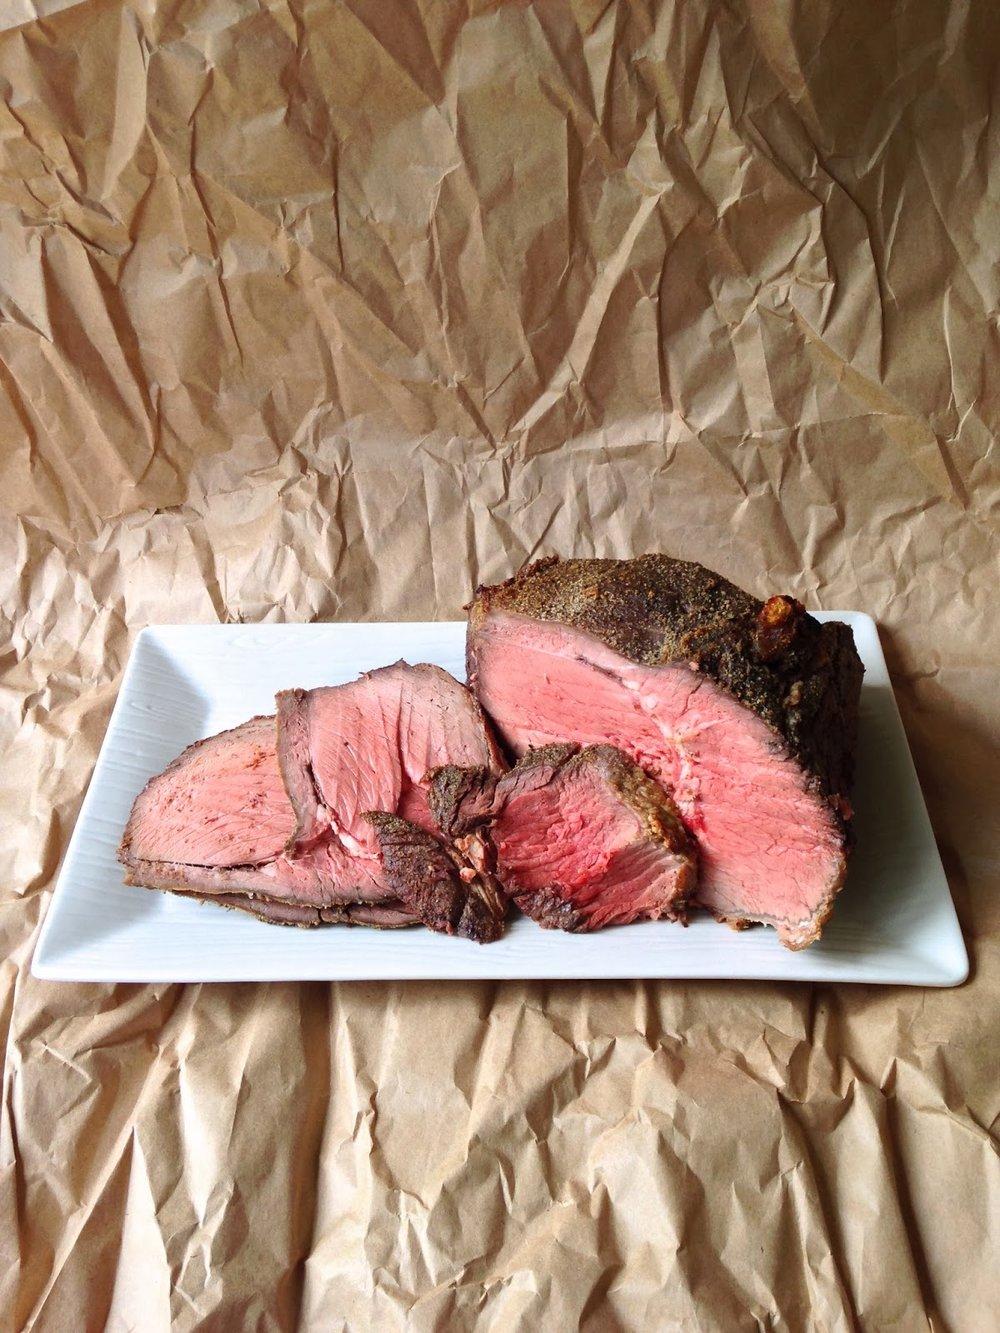 Deli Sliced Roast Beef Recipes